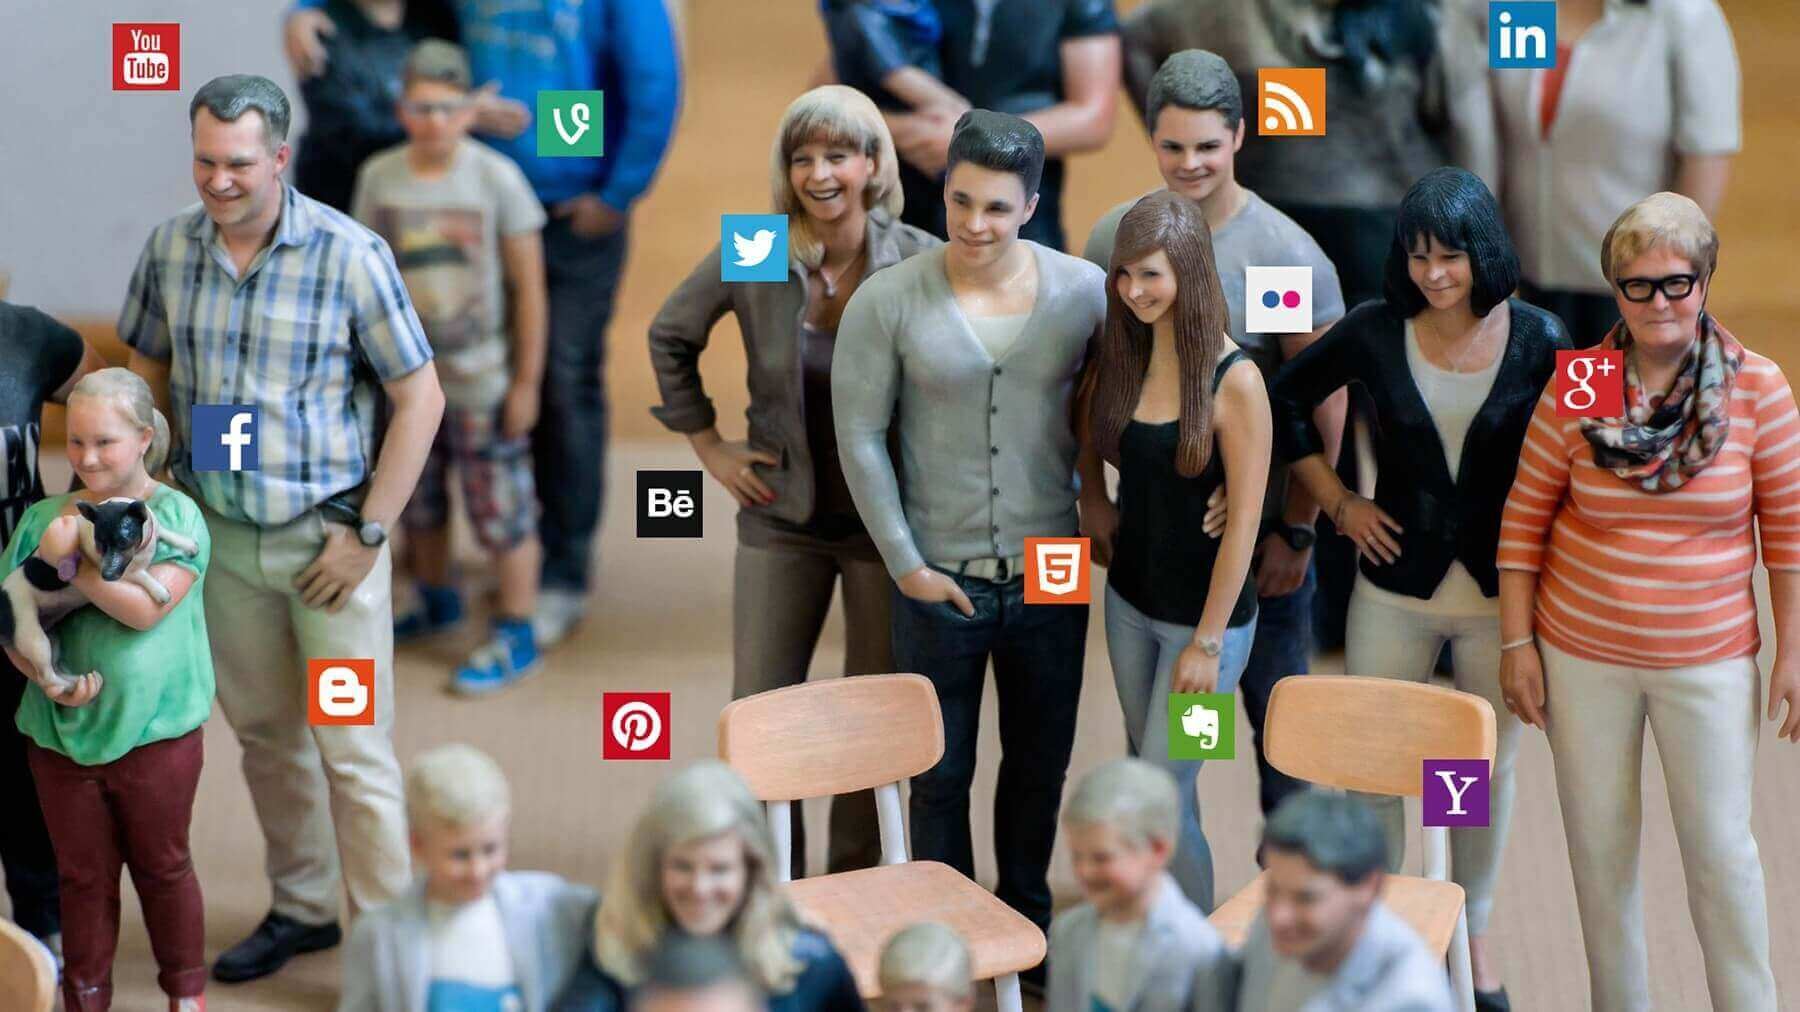 More than 3D selfie studios: The Doob Group | All3DP